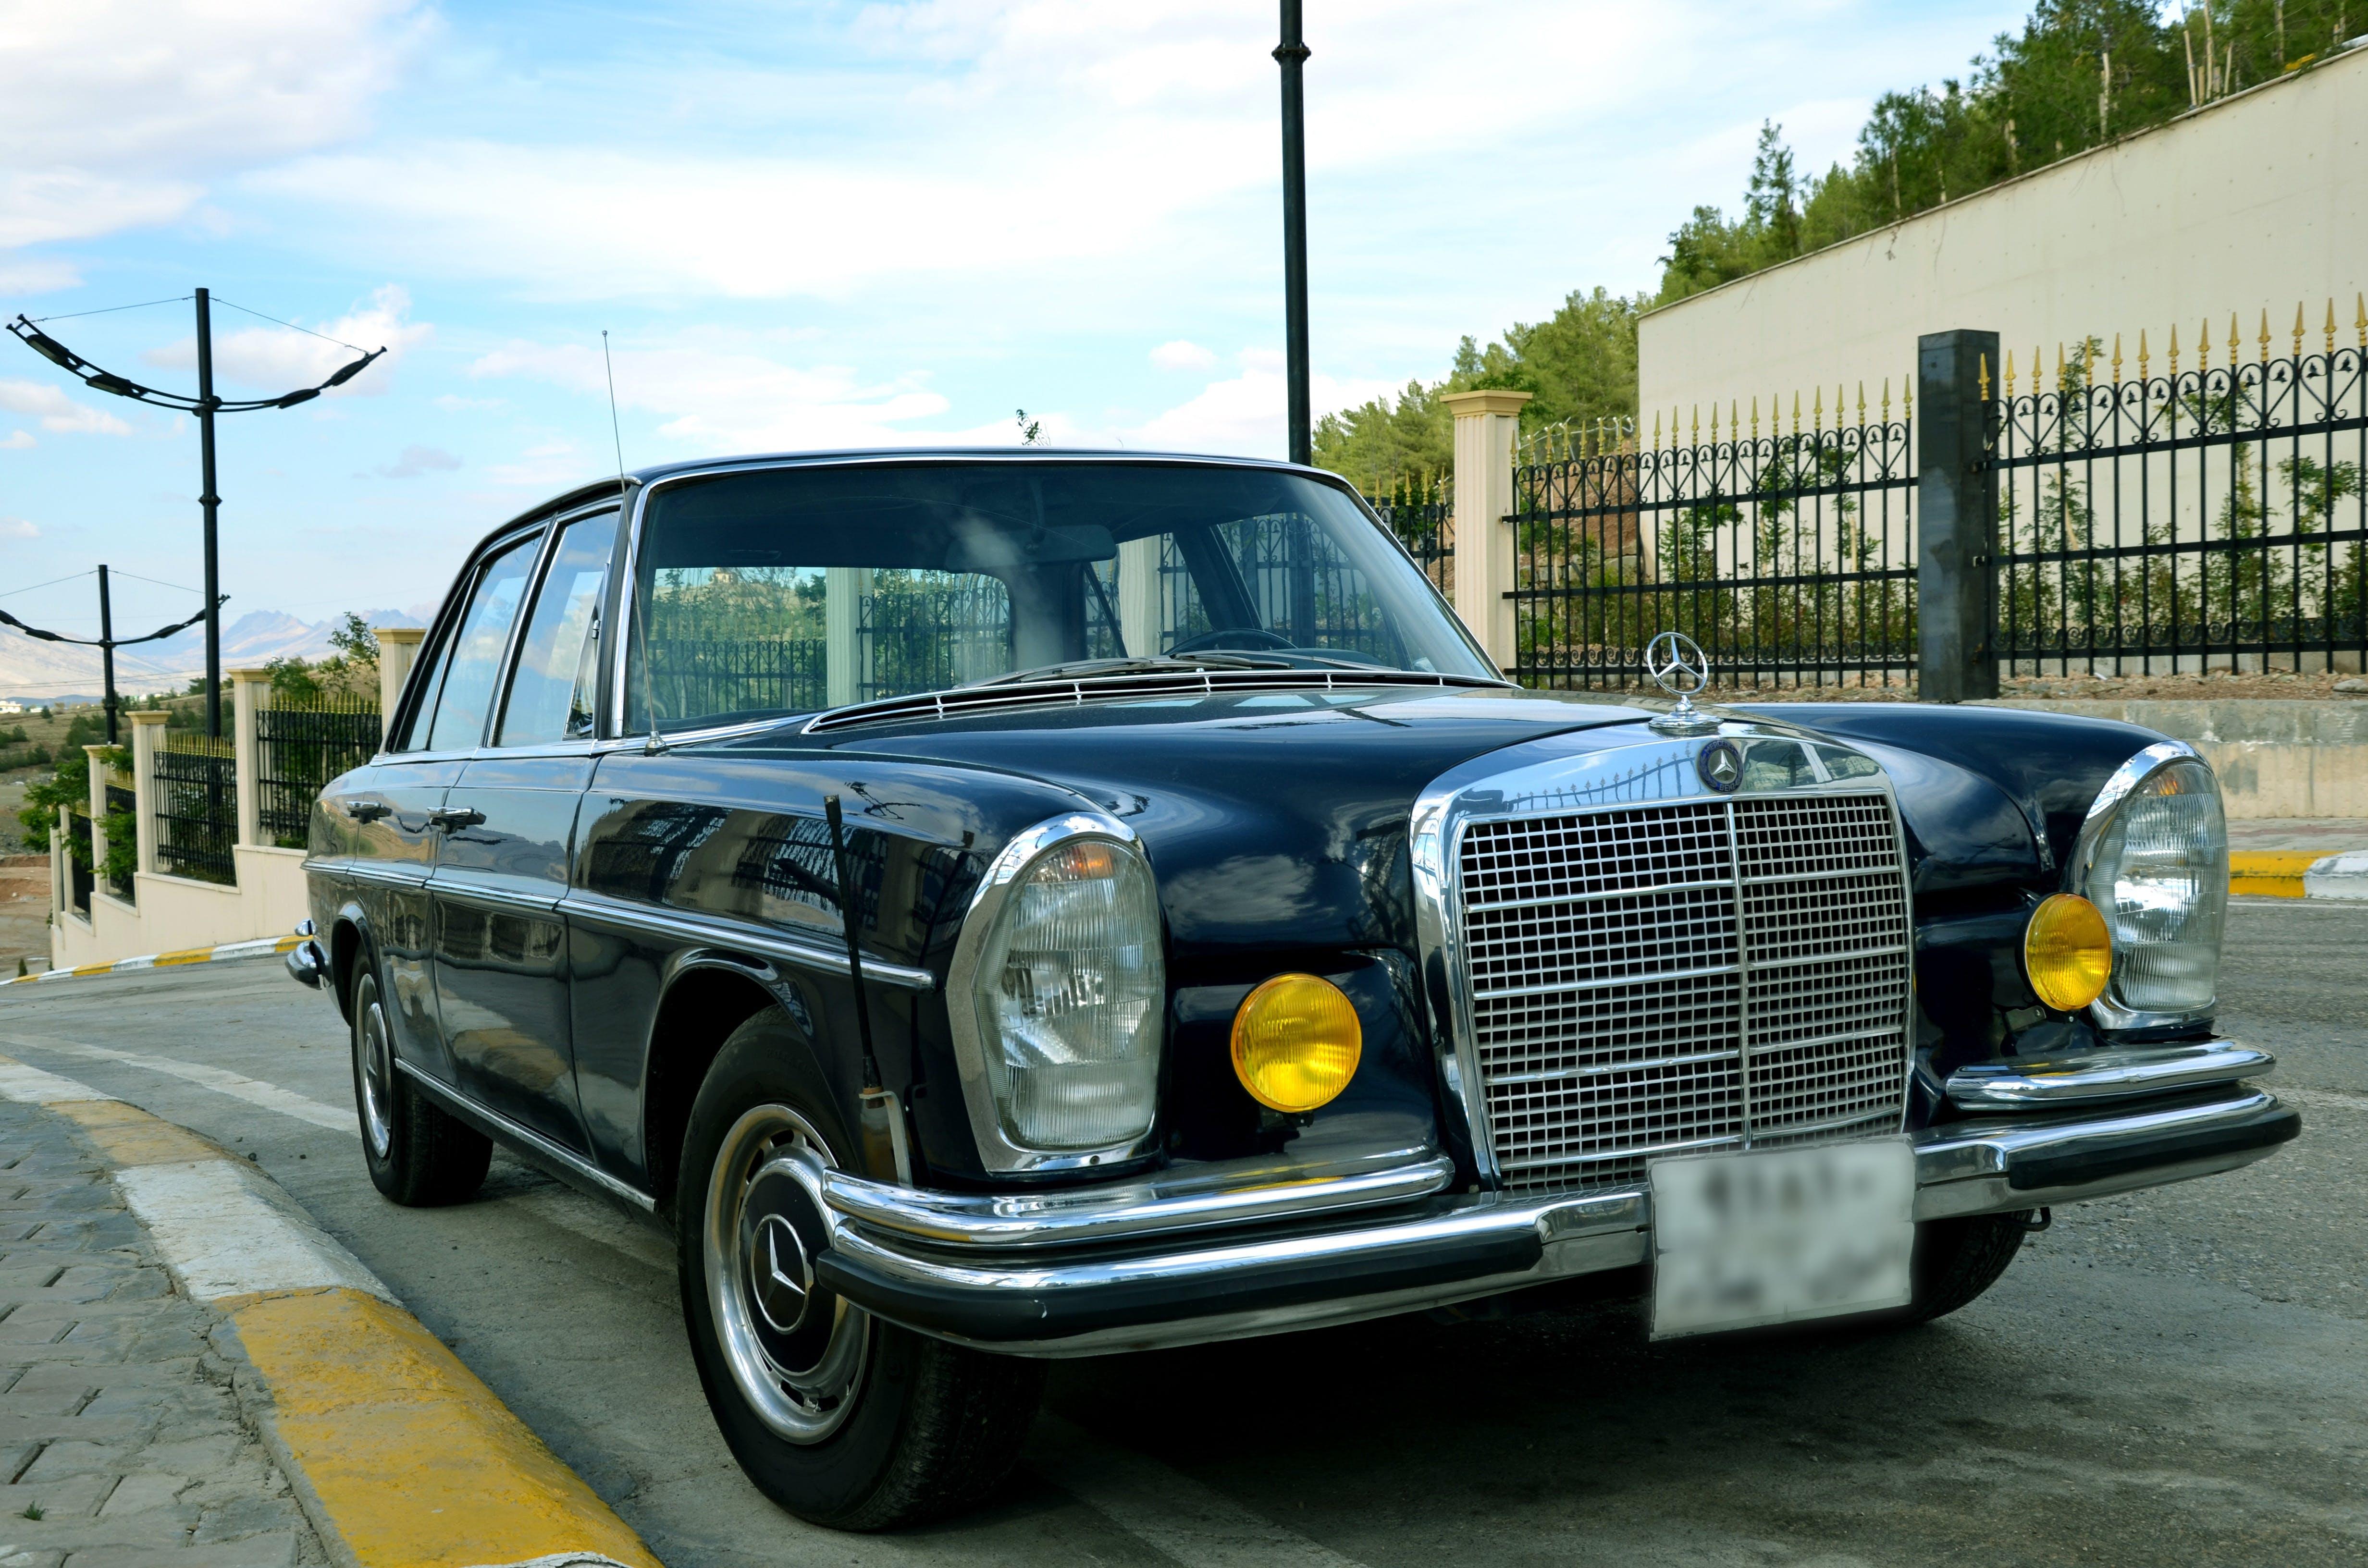 Free stock photo of model, car, vehicle, vintage